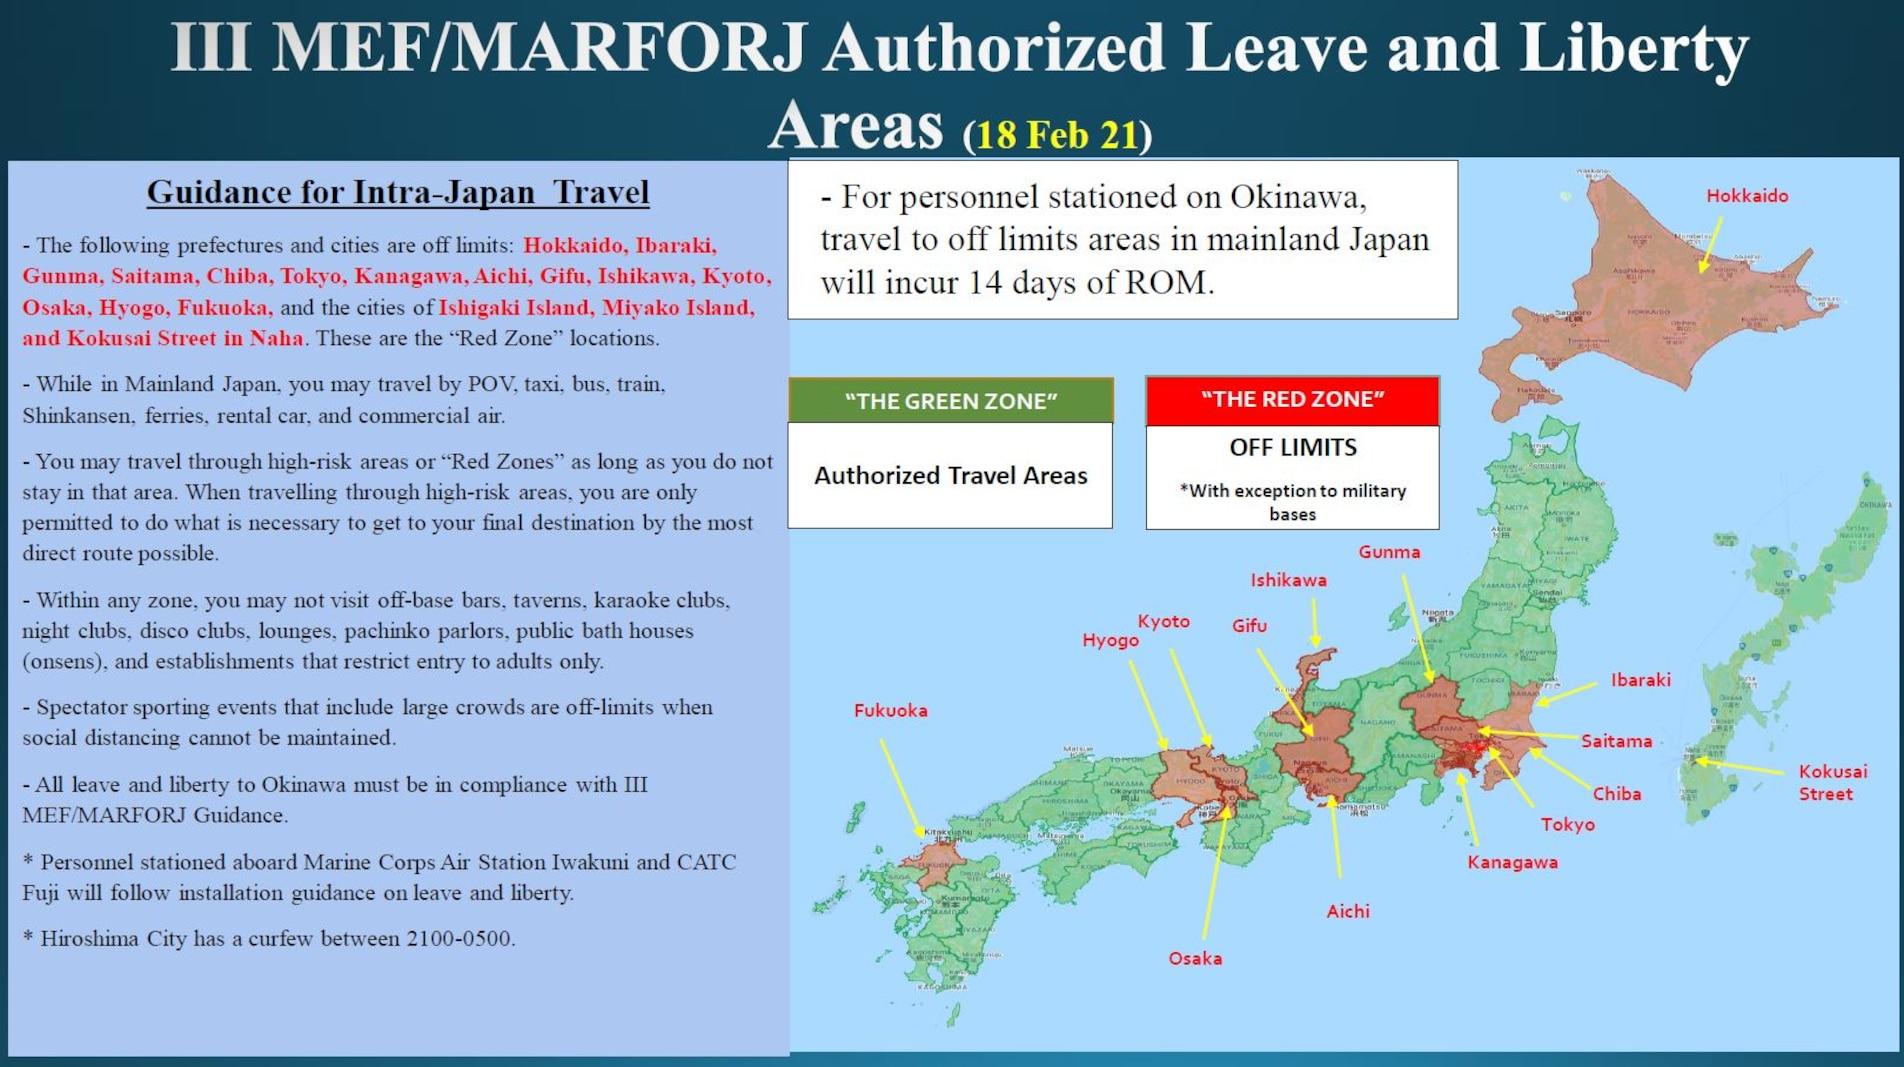 III MEF/MARFORJ Leave and Liberty Areas